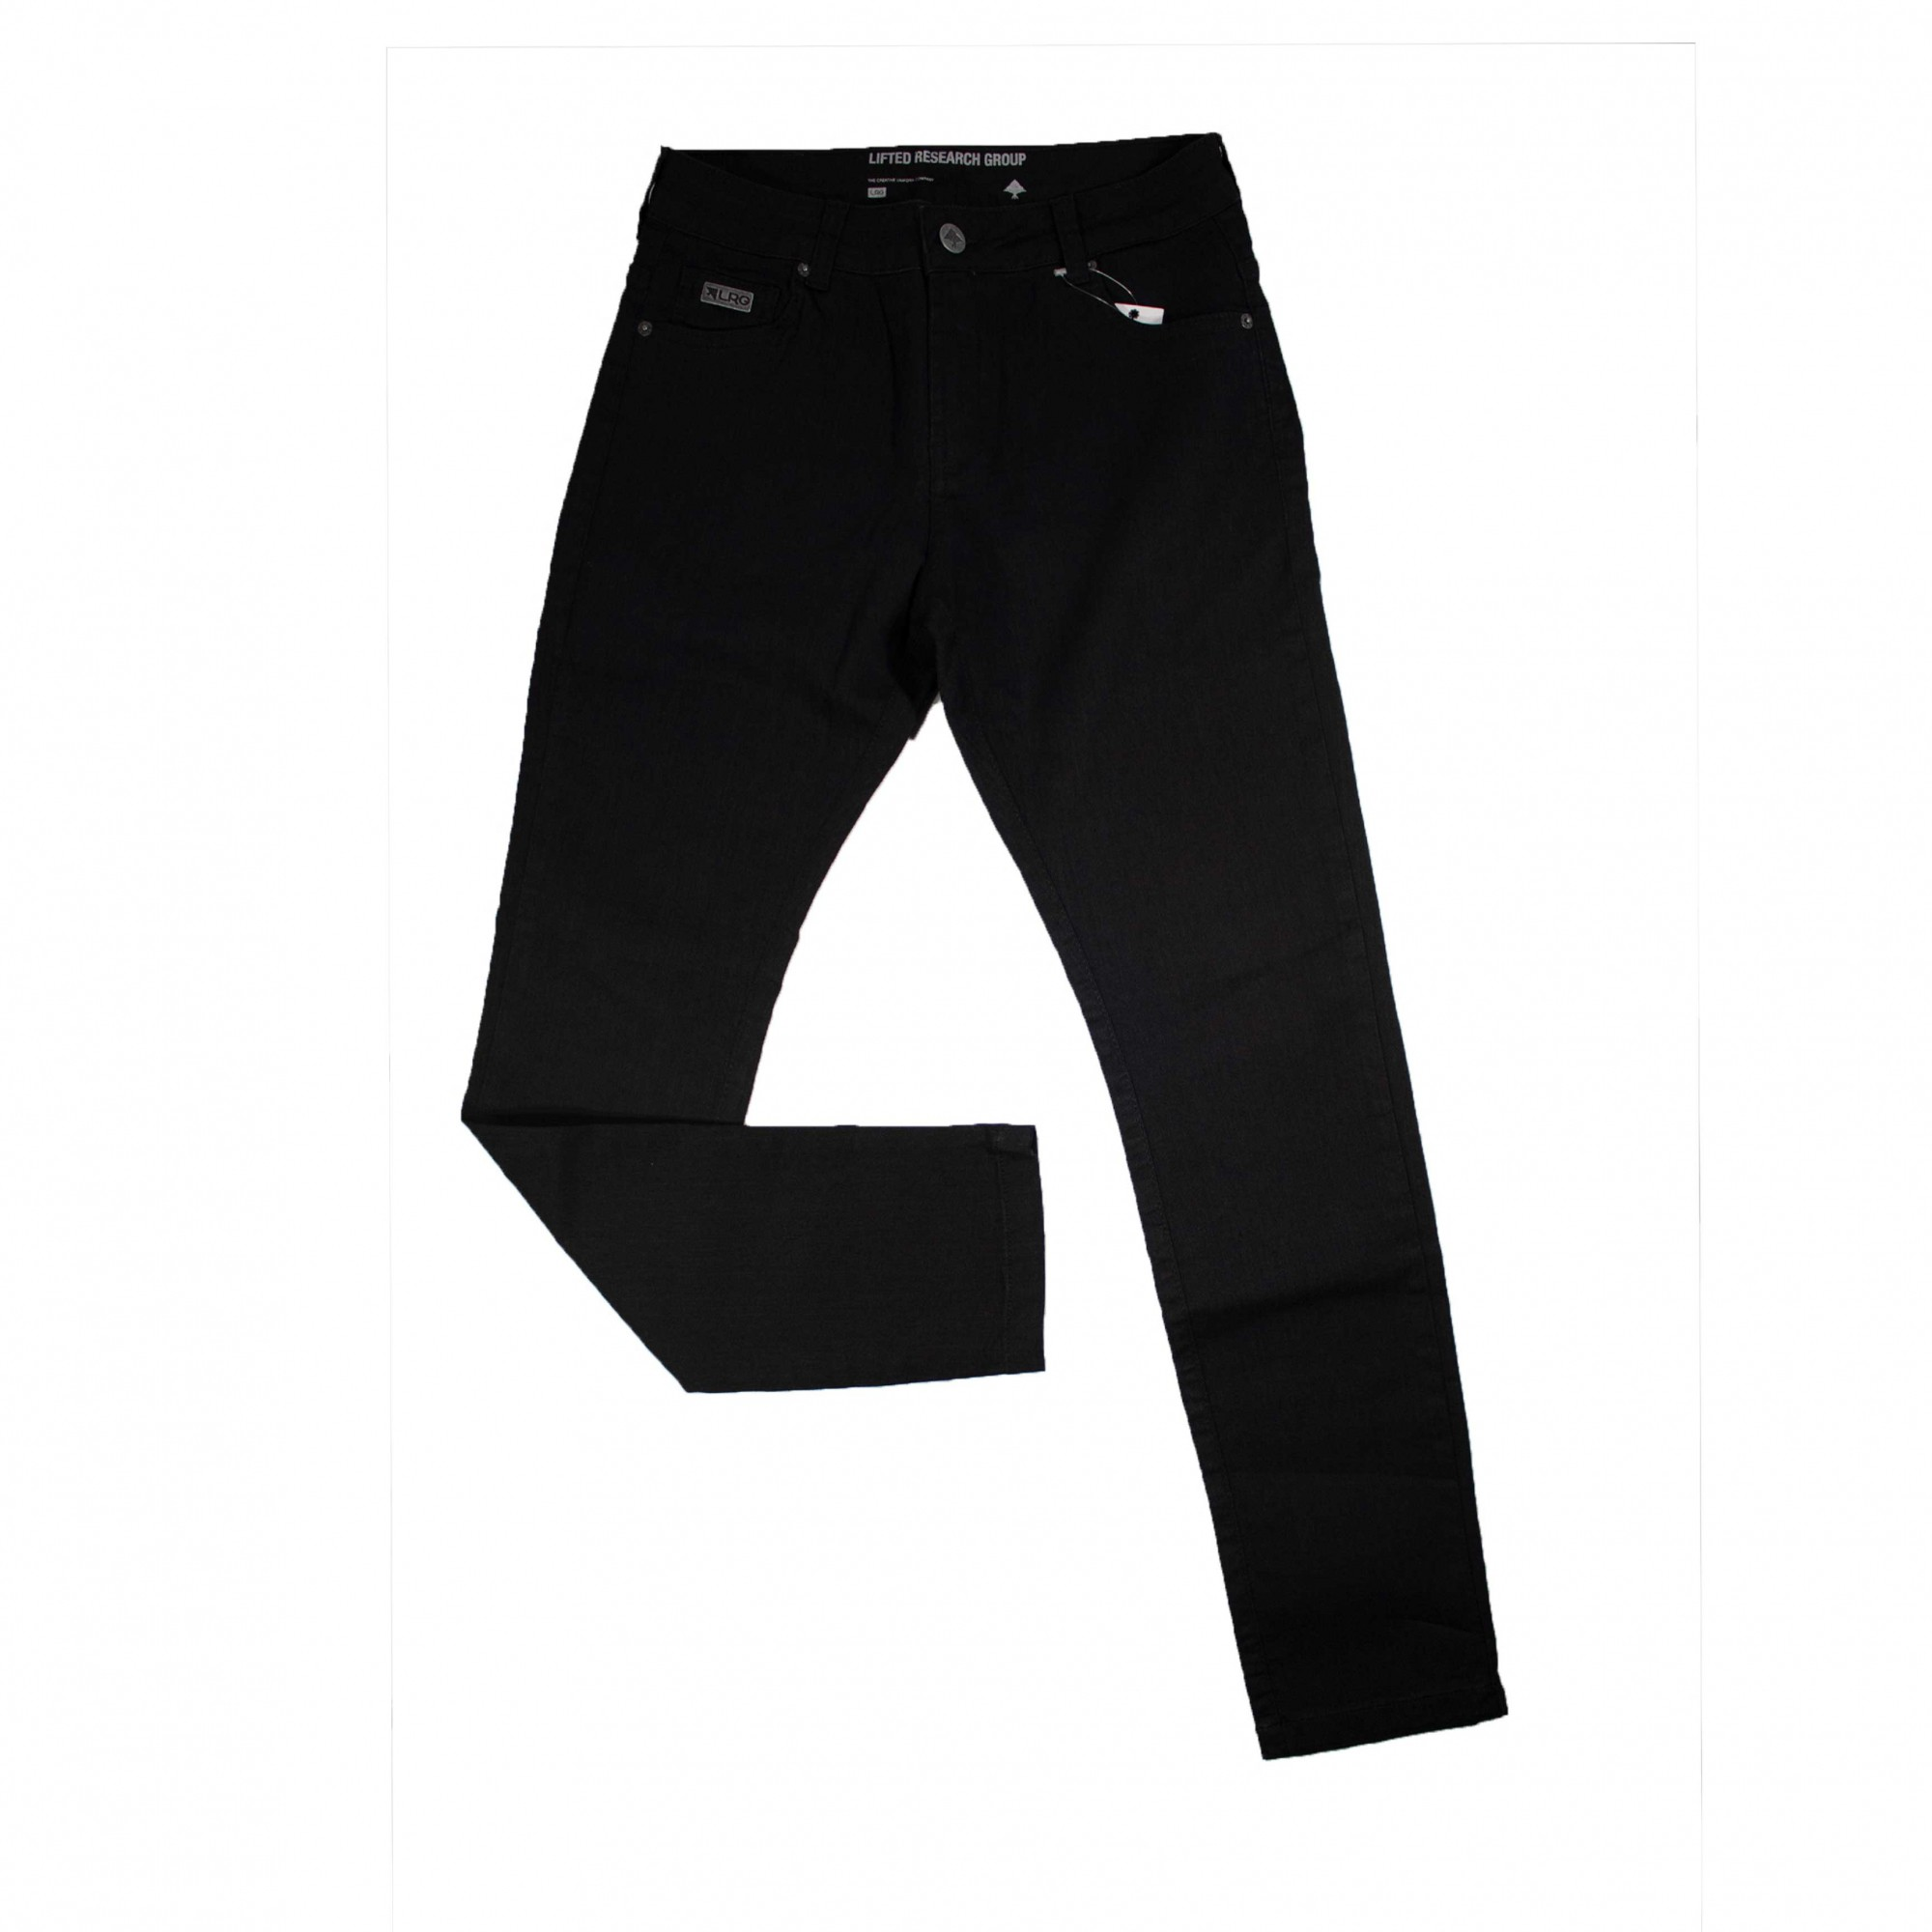 Calça LRG Jeans Black